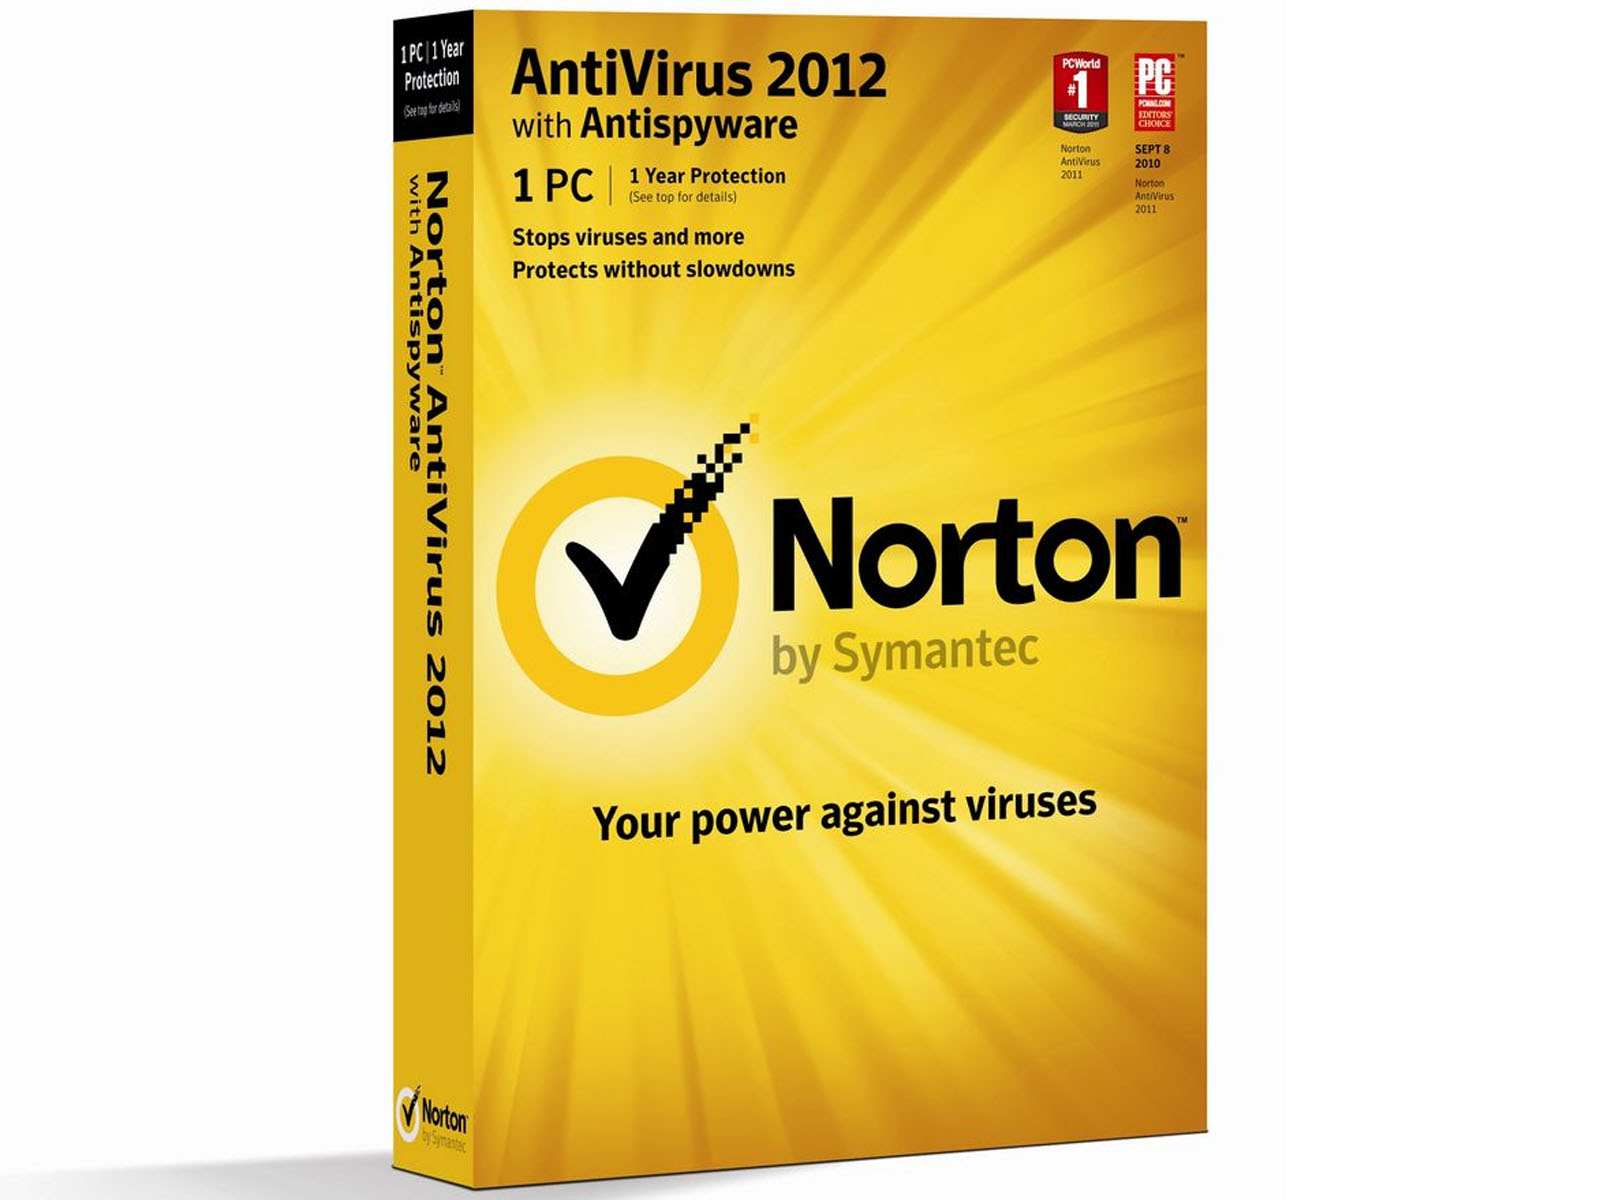 Welove Giveaways 6 Months Free Norton Antivirus 2012